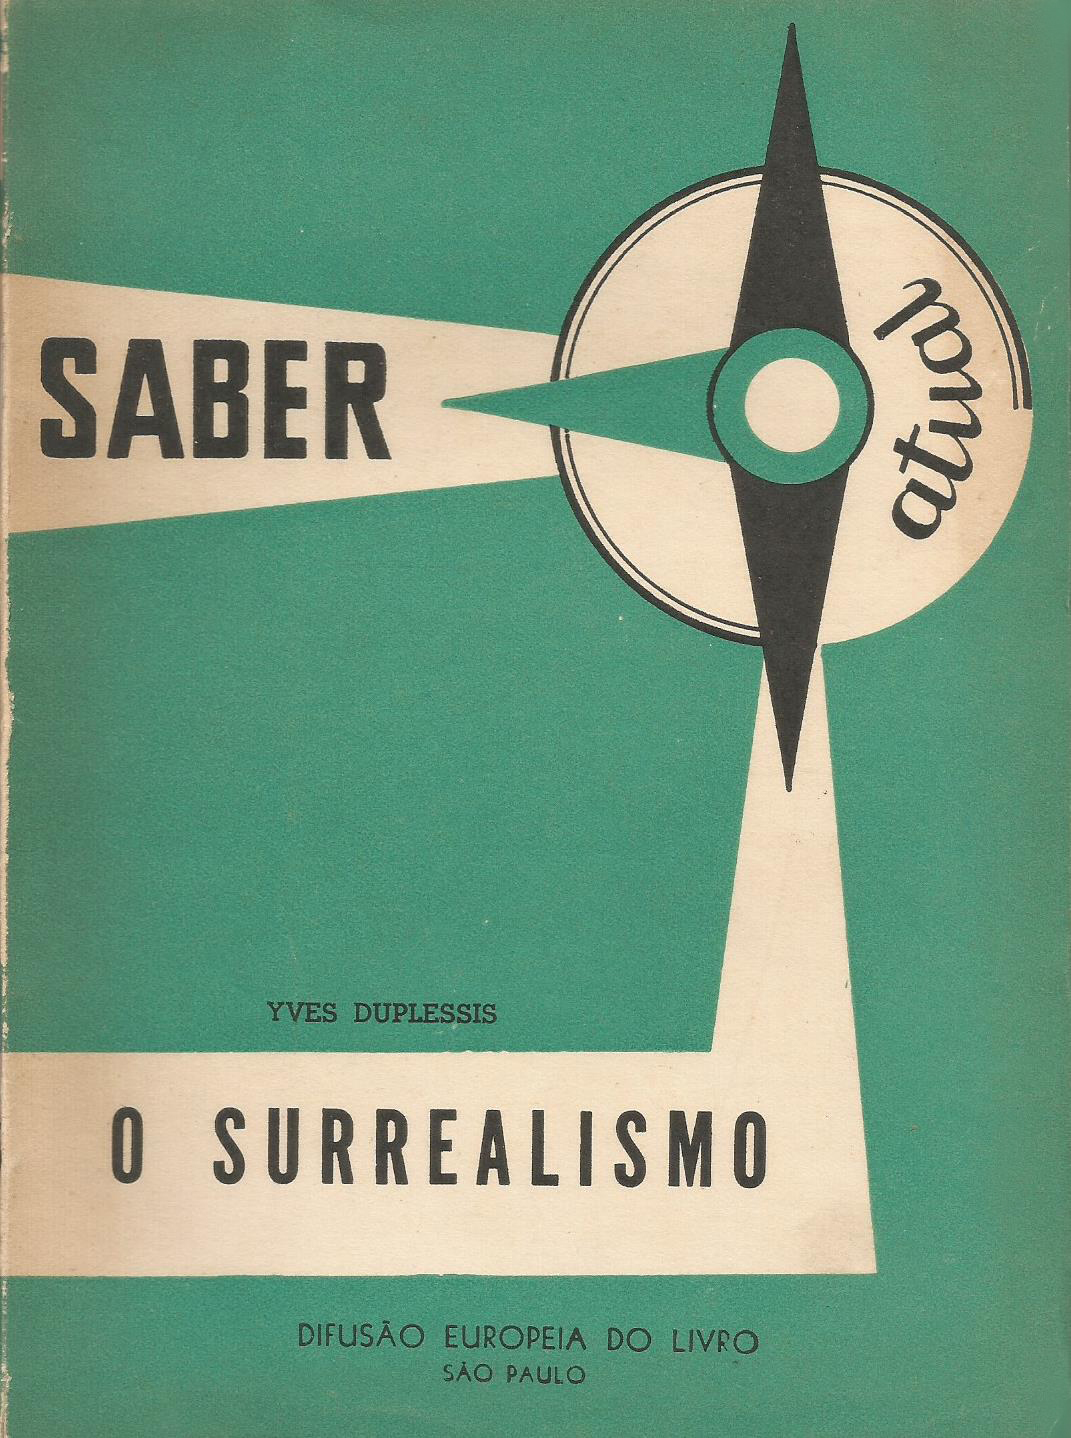 O Surrealismo Yves Duplessis